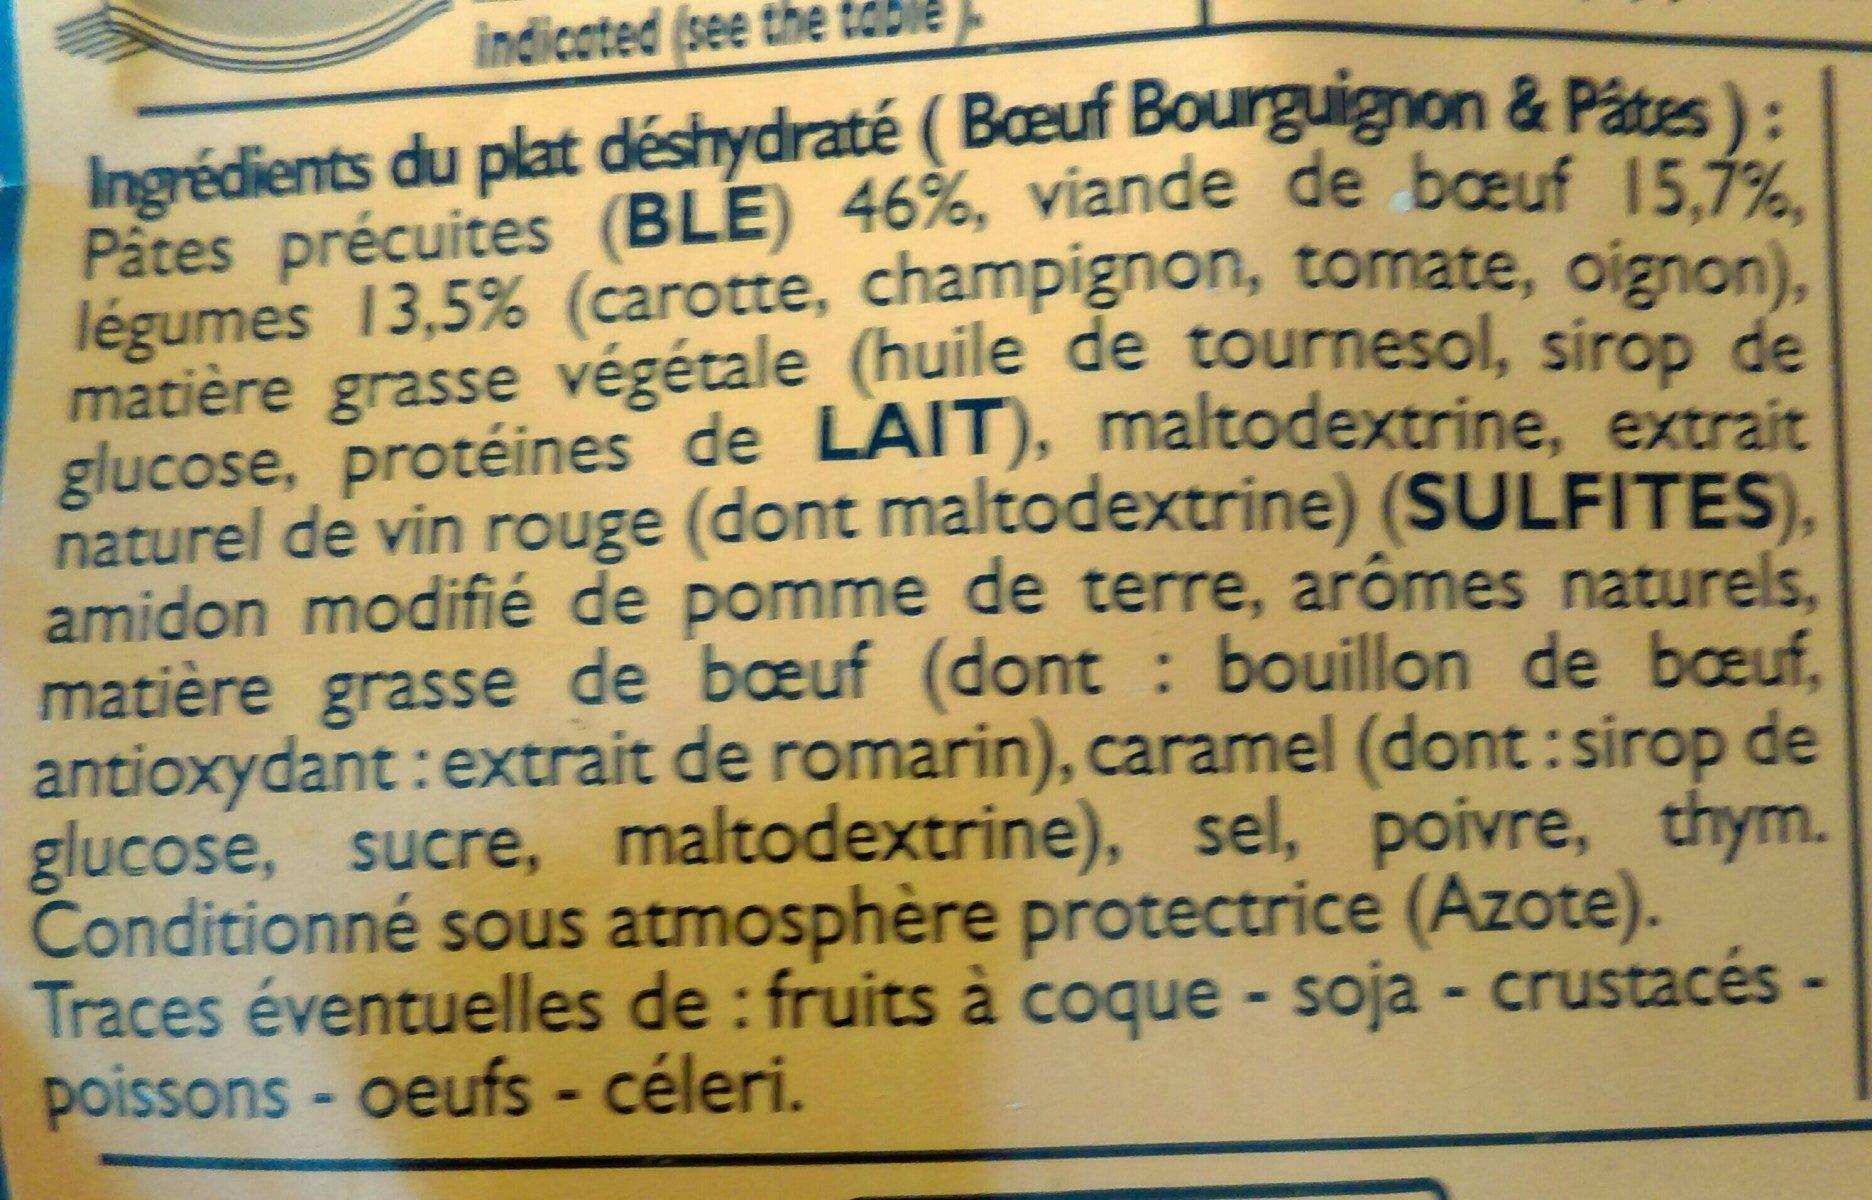 Boeuf bourguignon et pâtes - Ingrediënten - fr